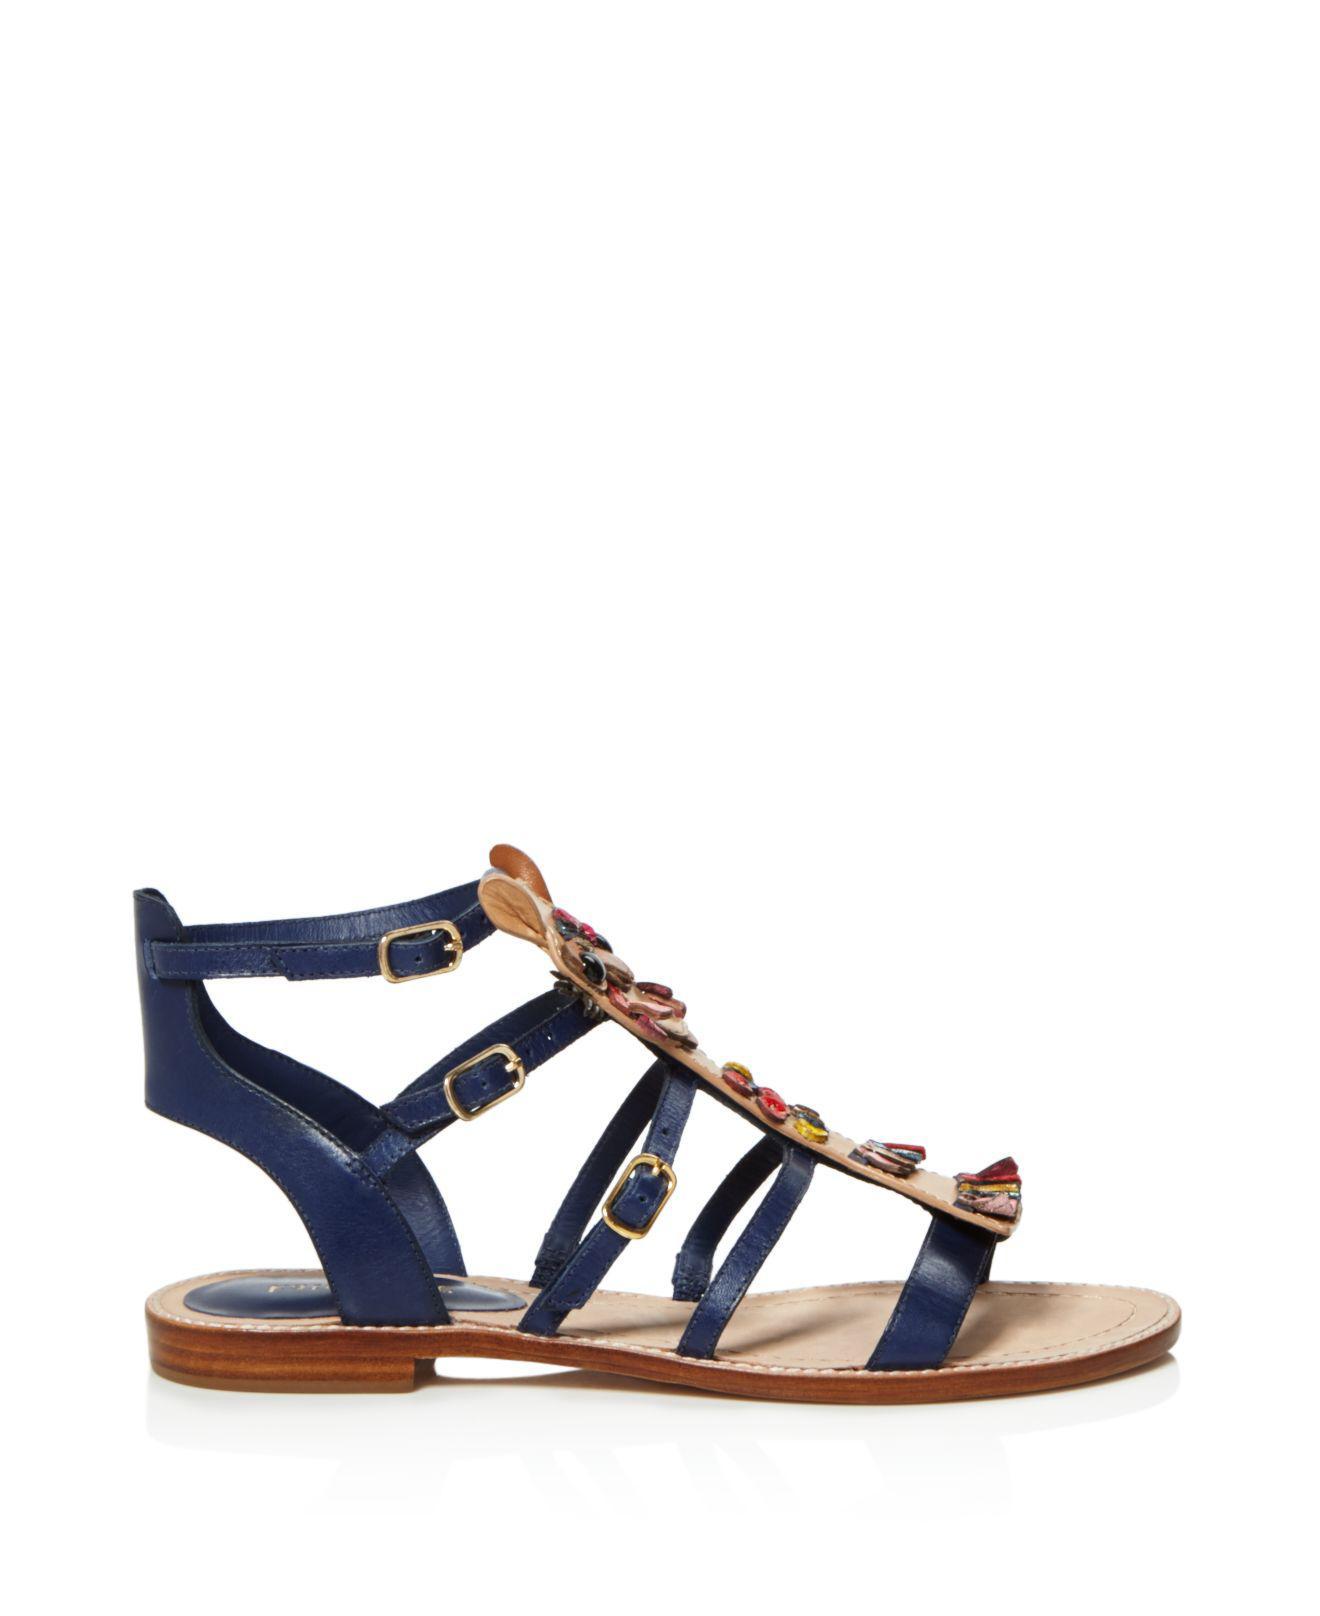 ada7fe0dc33e3 Lyst - Kate Spade Sahara Strappy Sandals in Blue